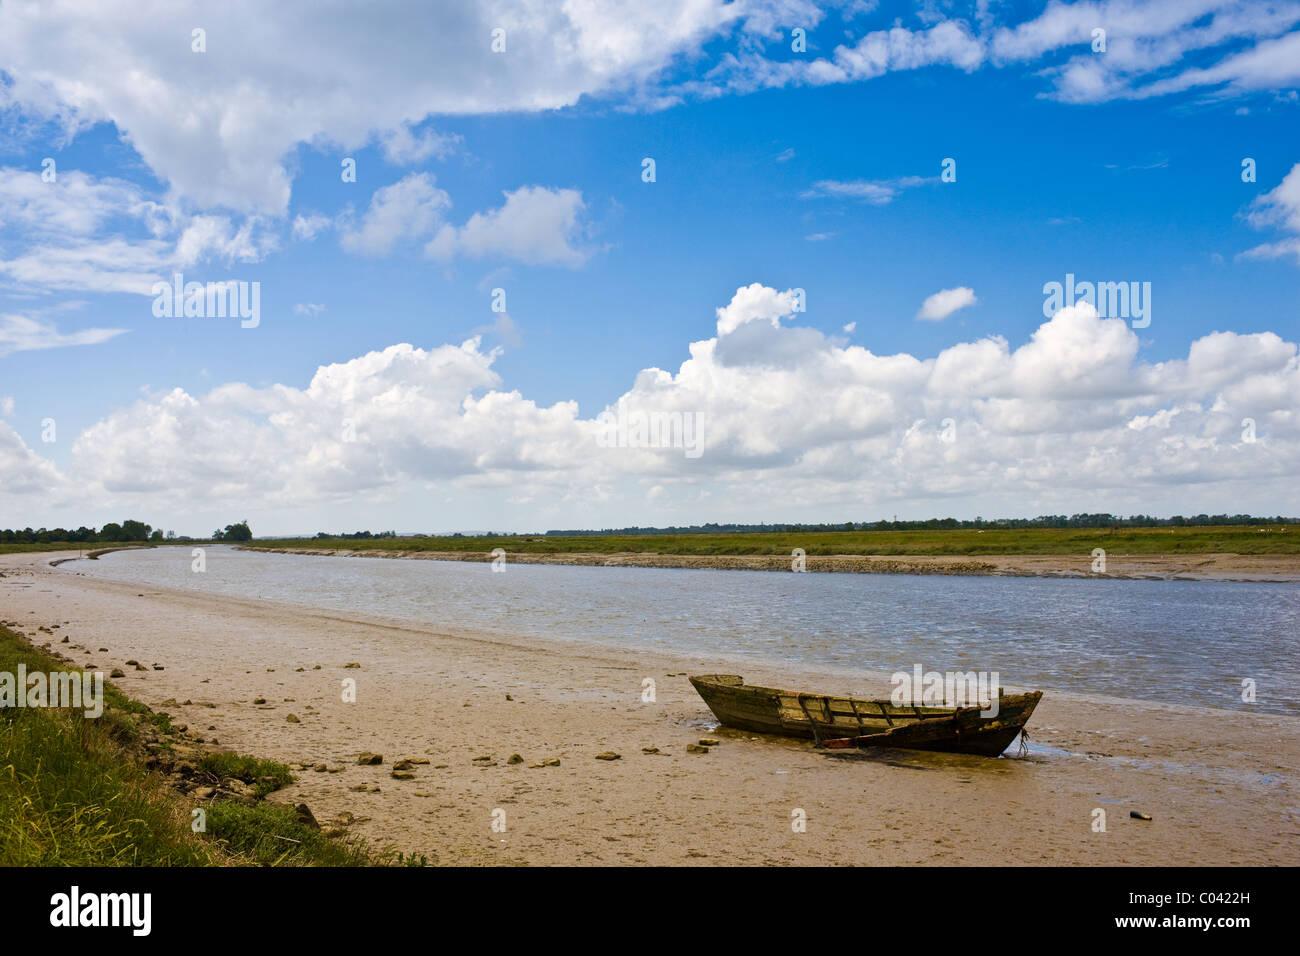 Old wrecked fishing boat in Les Marais de la Douve, the Marais marshland area of Normandy, France - Stock Image